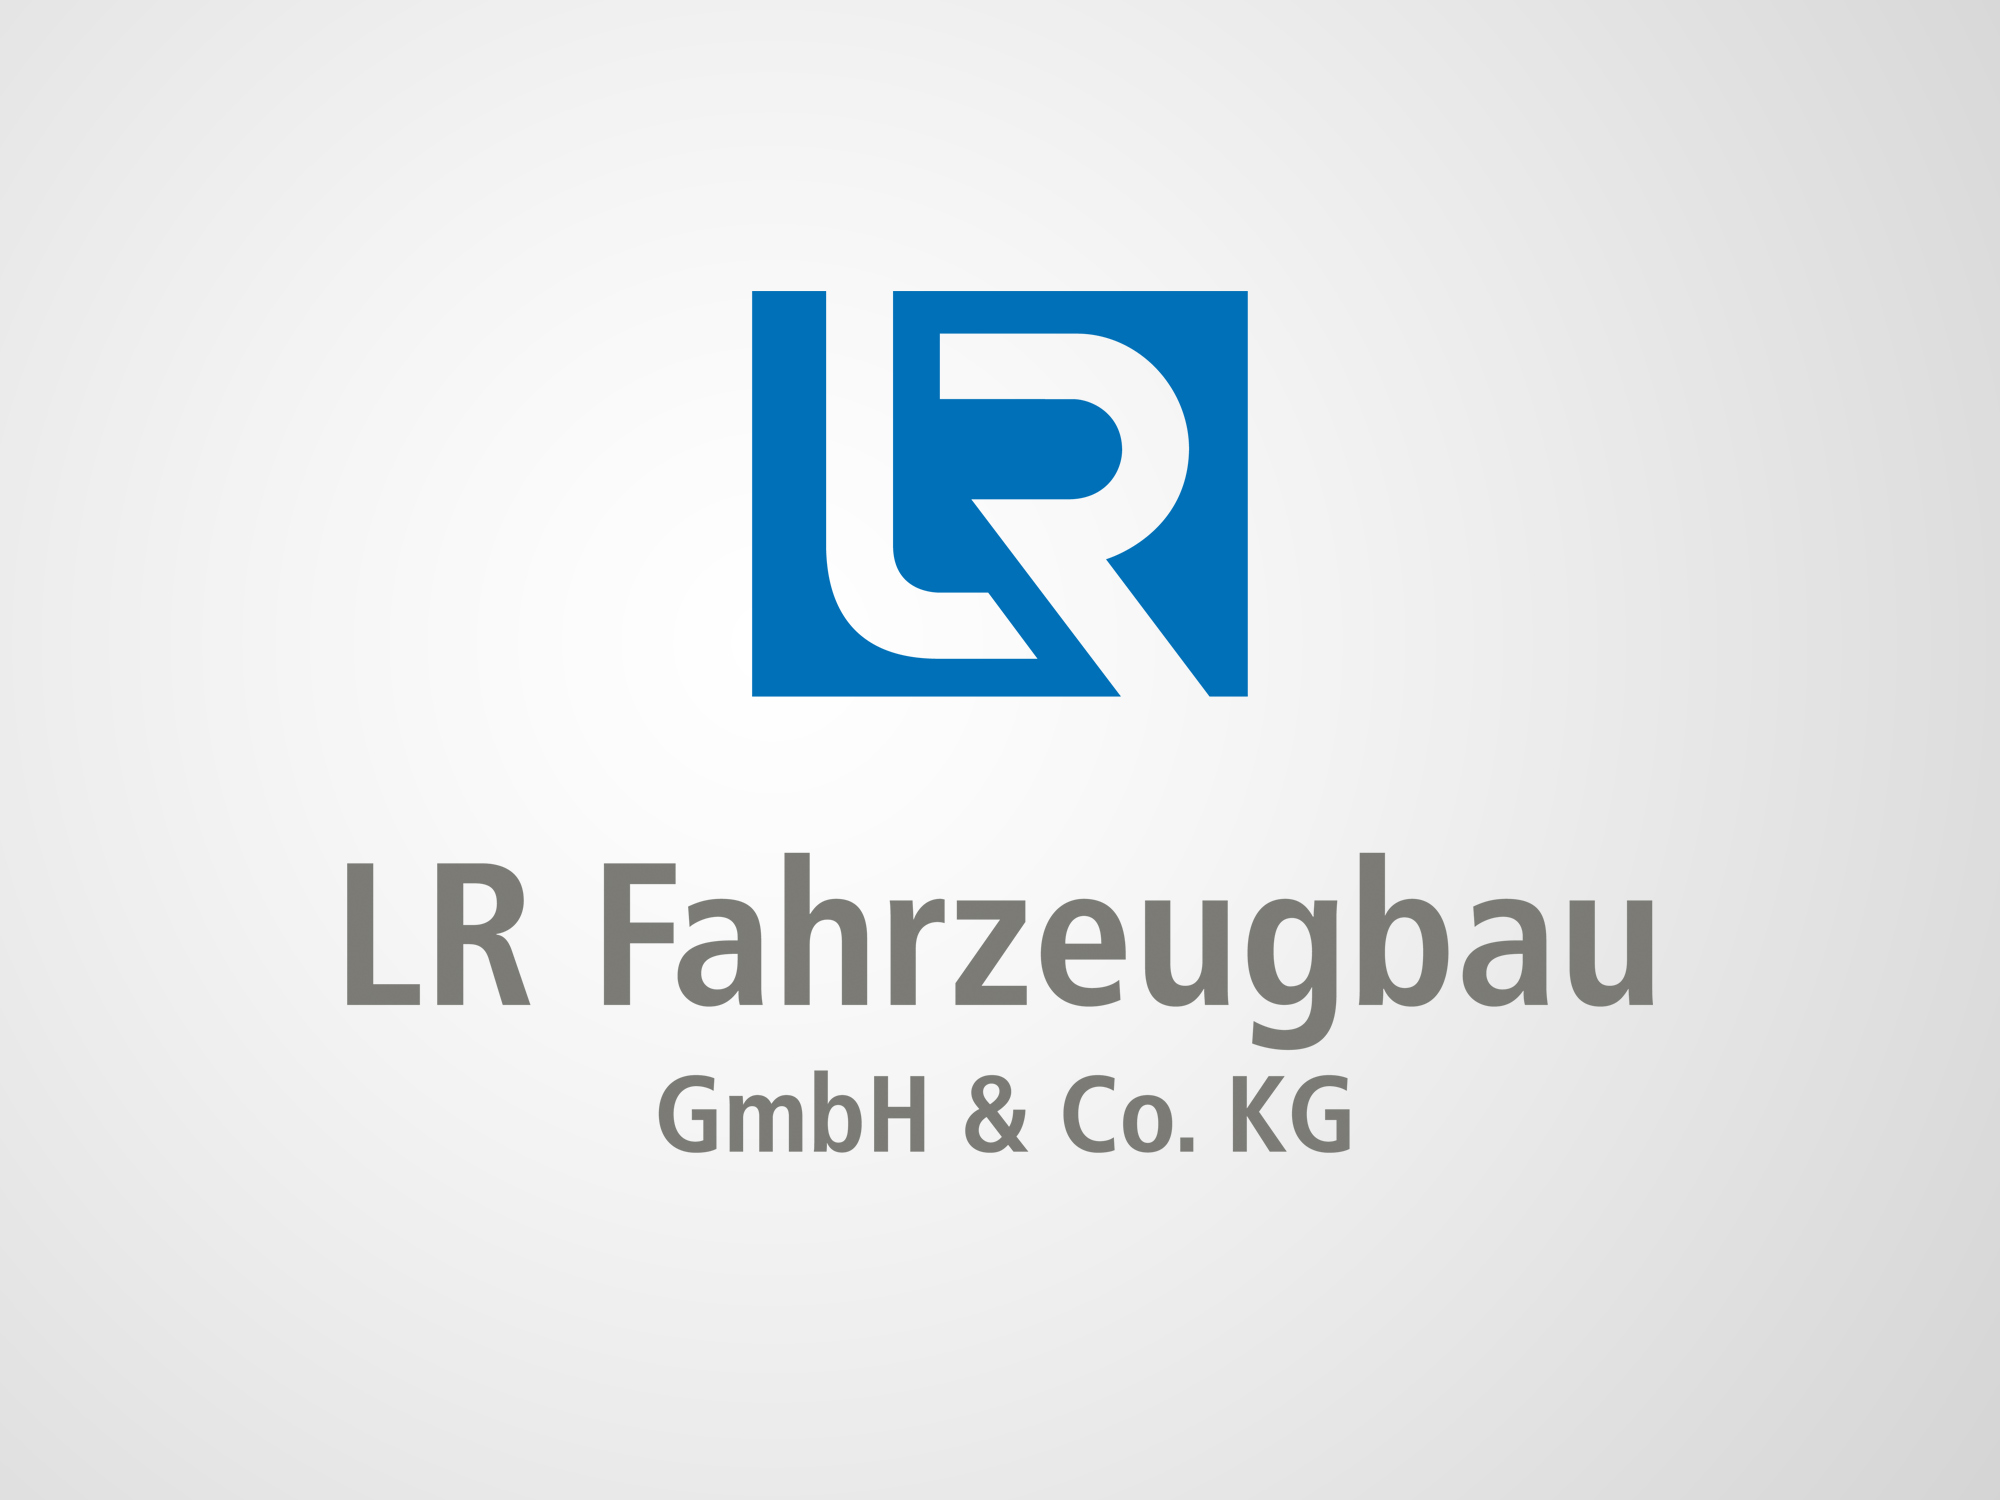 Logogestaltung-LR-Fahrzeugbau